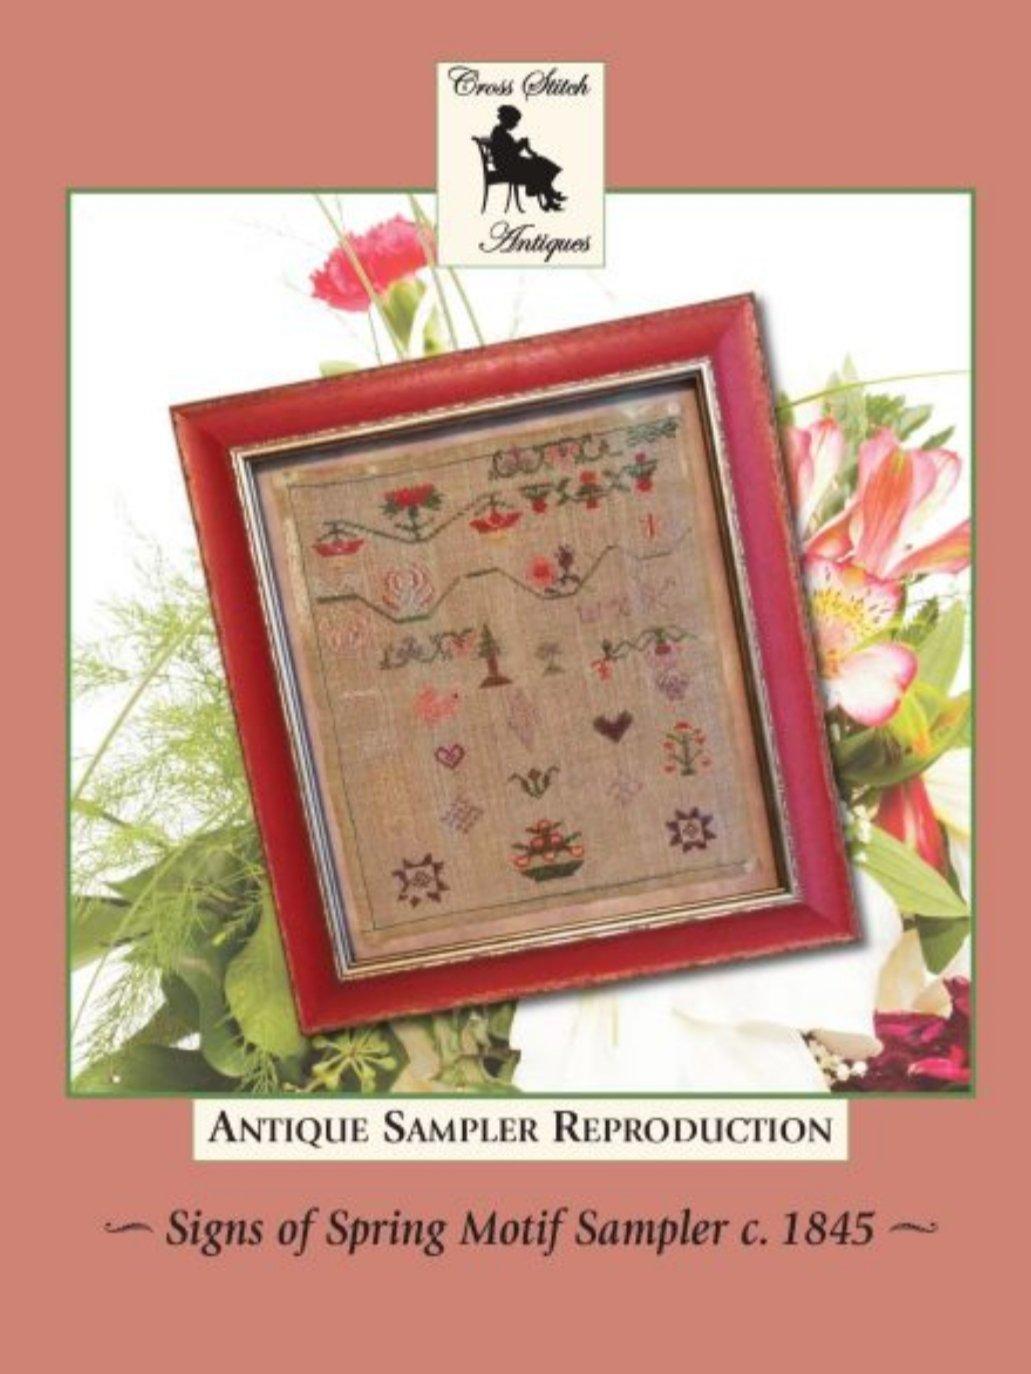 Cross Stitch Antiques - Signs of Spring Motif Sampler